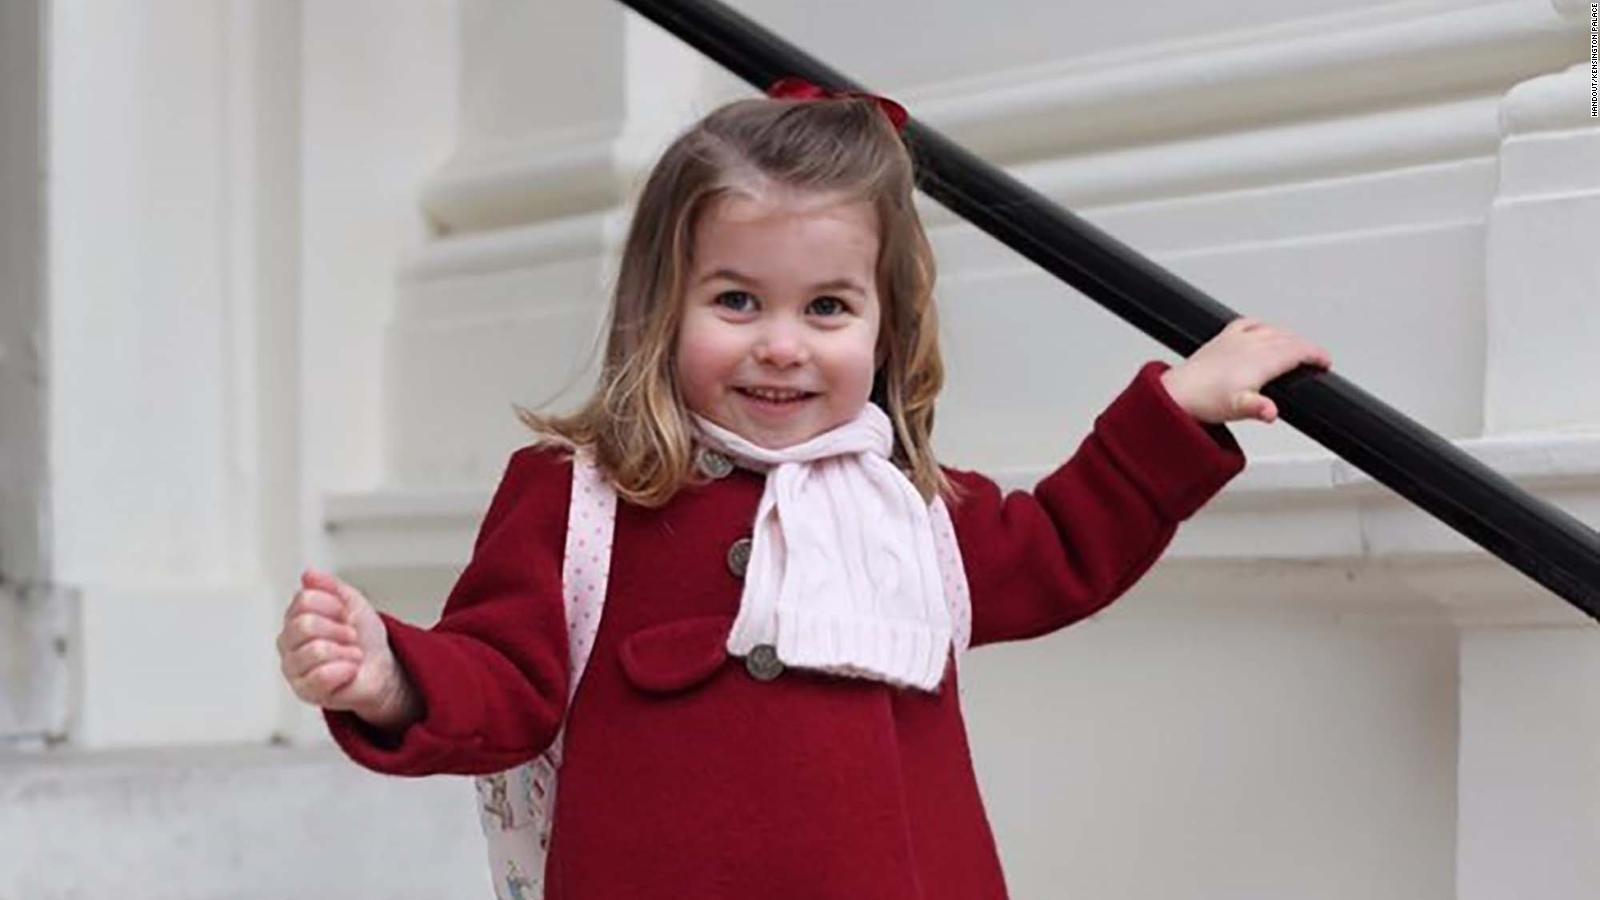 180108161026 01 princess charlotte starts nursery school 0108 full 169.jpg?resize=300,169 - 8 regras que a princesa Charlotte já é obrigada a seguir